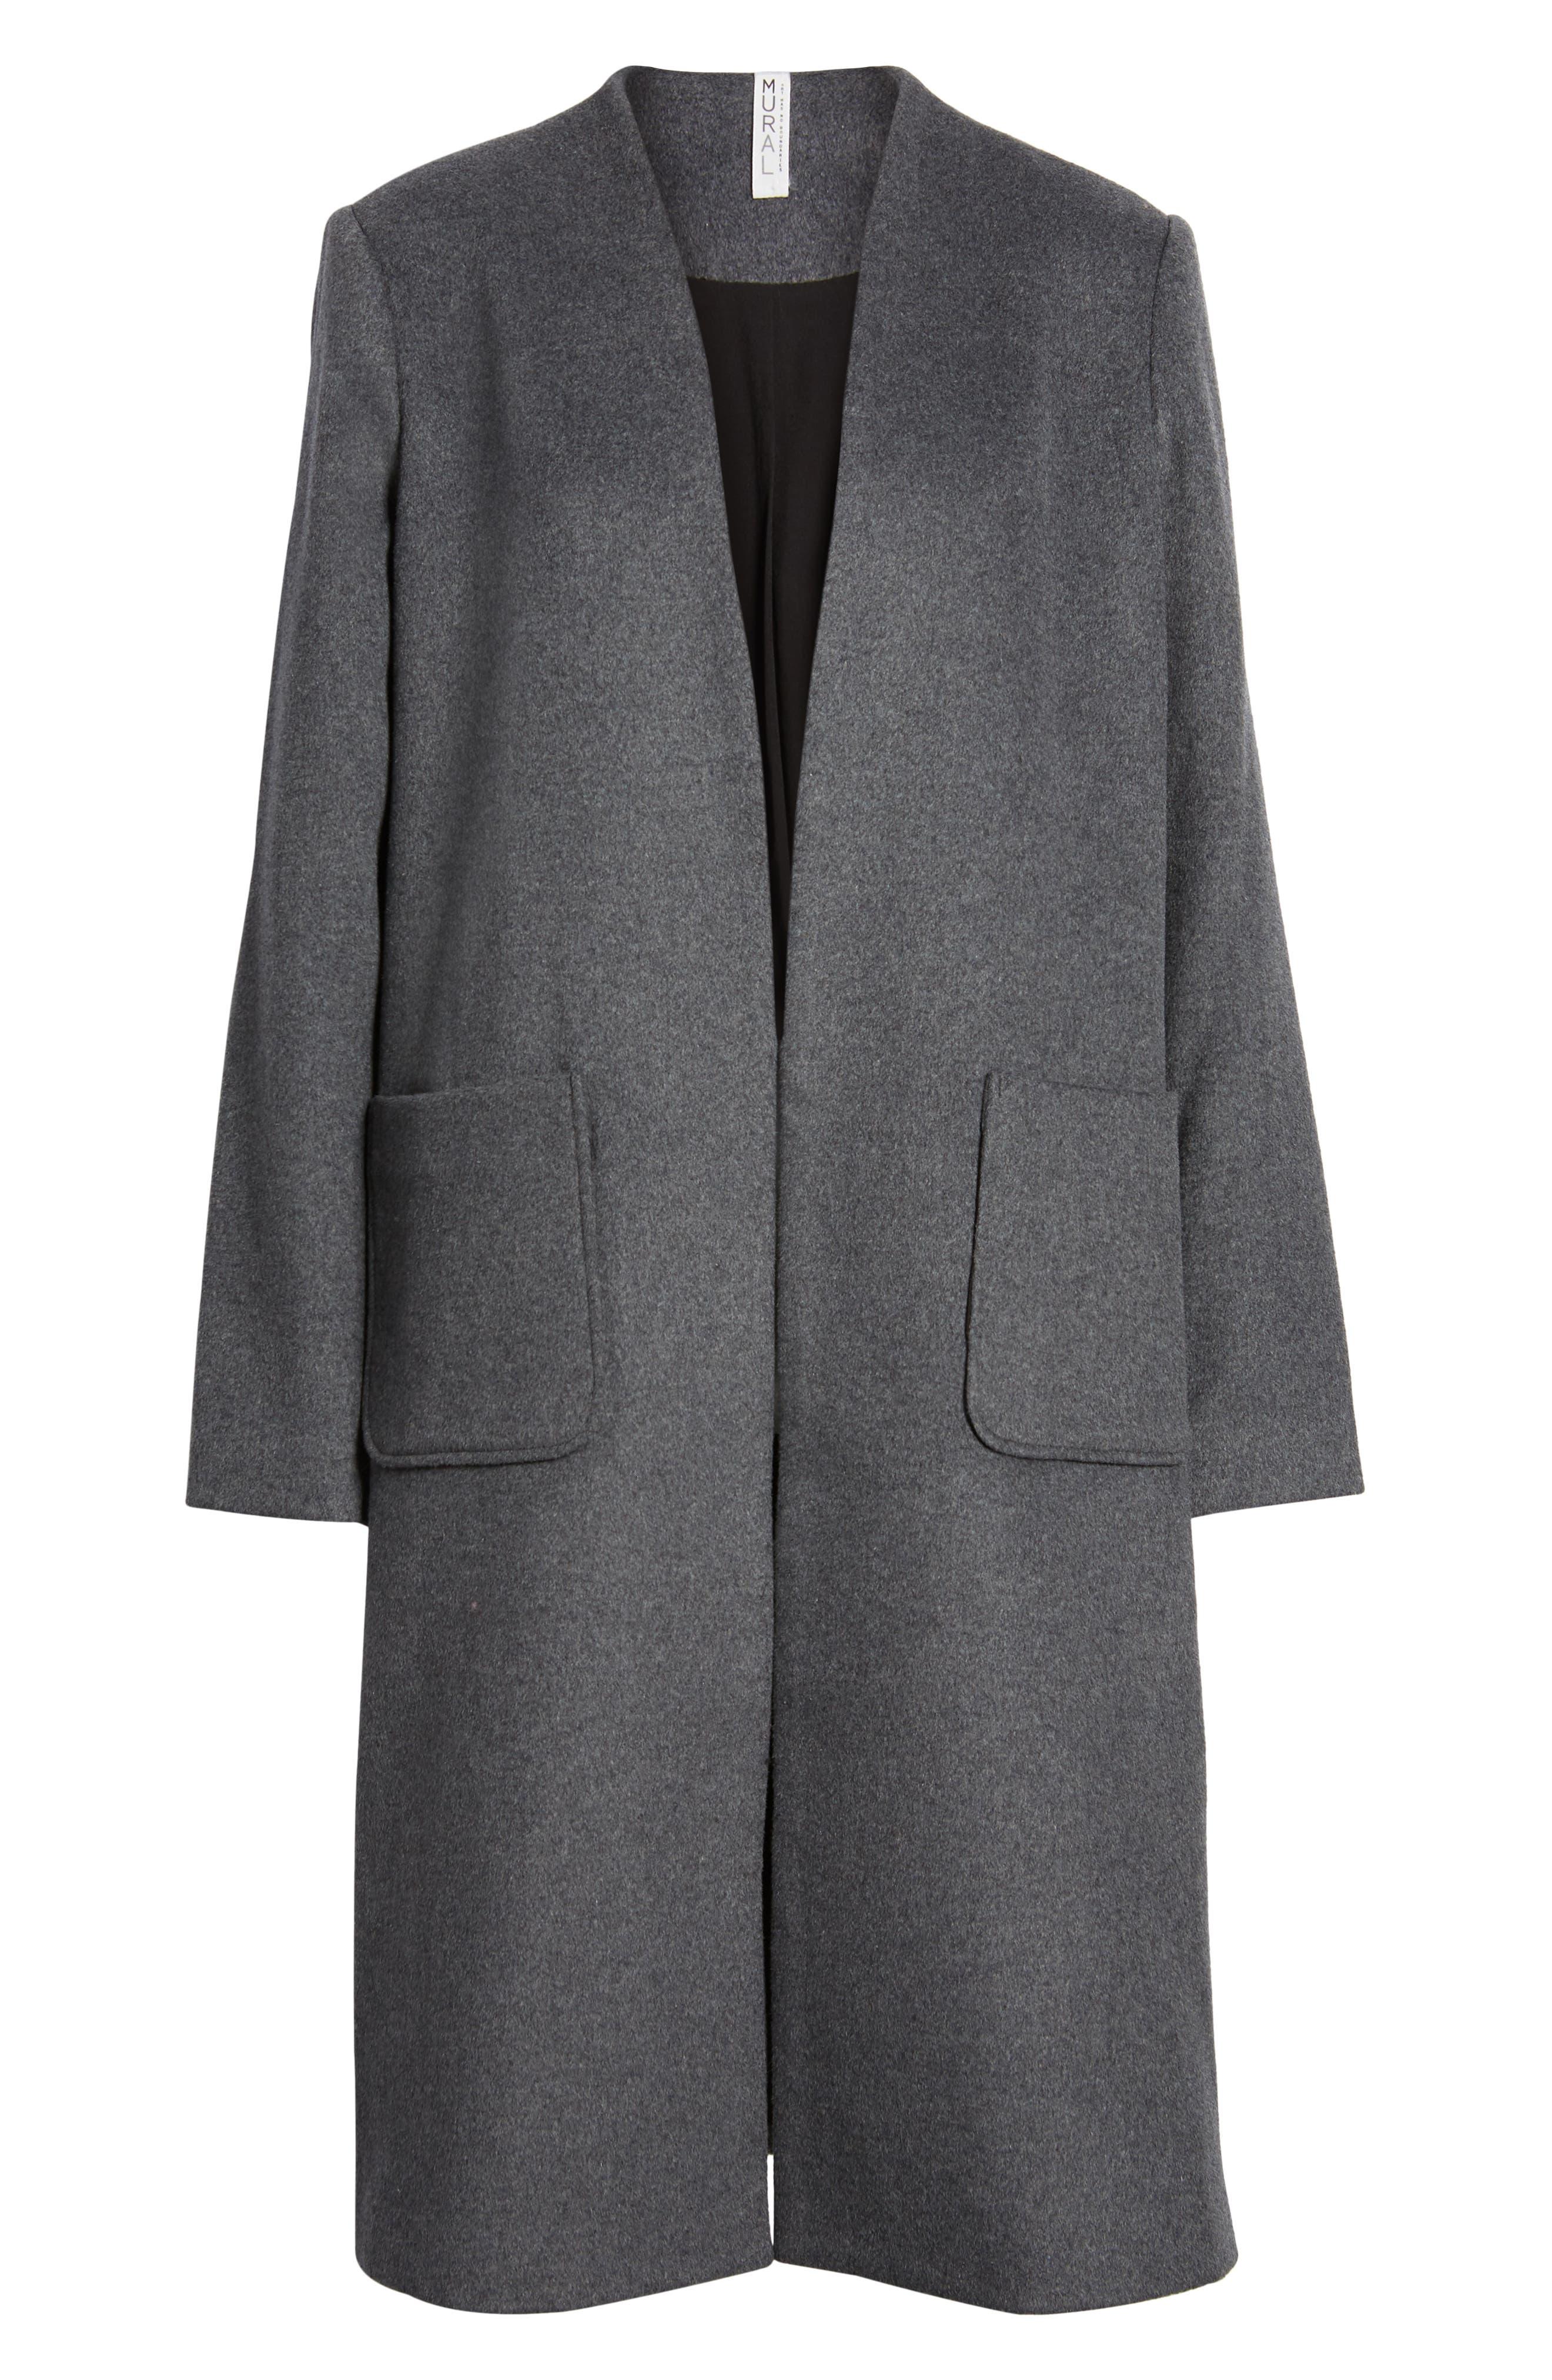 MURAL, Long Open Front Coat, Alternate thumbnail 6, color, 020